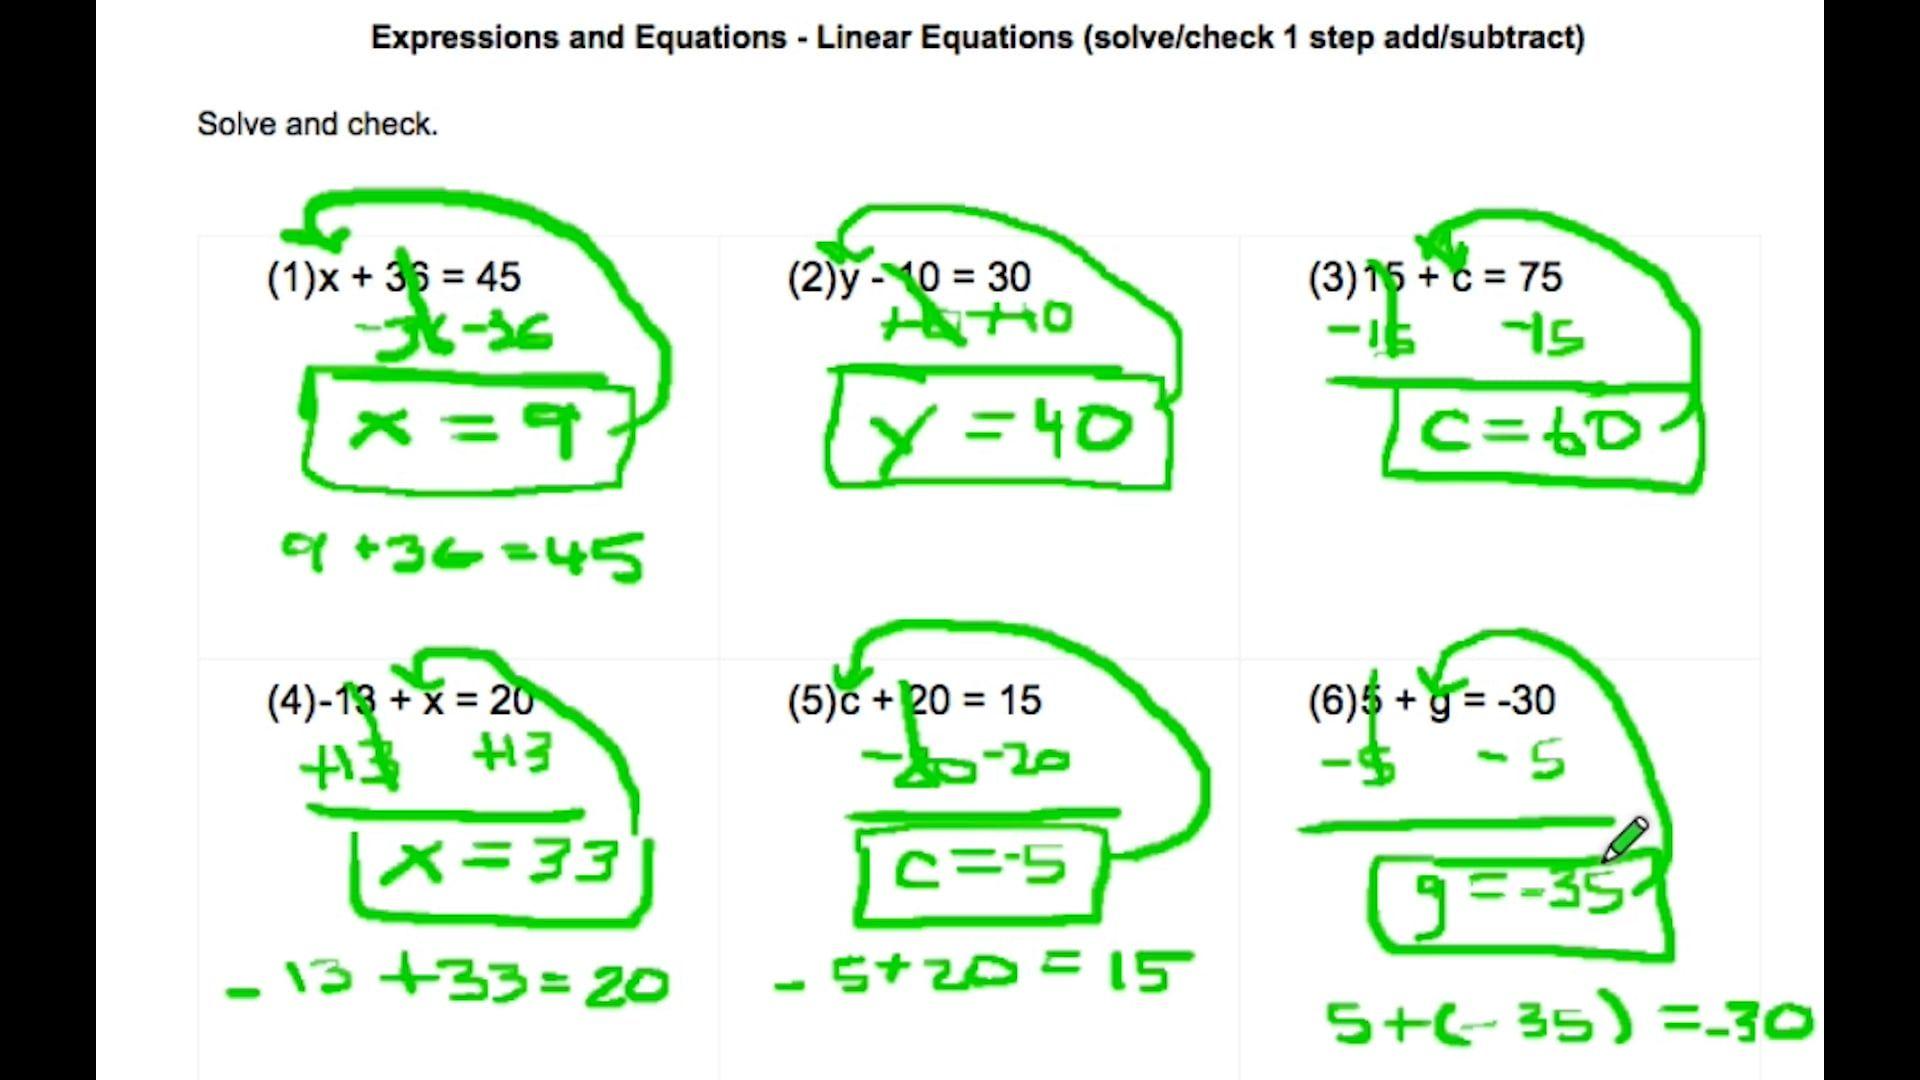 ExprEquLinearEquationsAdding_Subtracting Solving